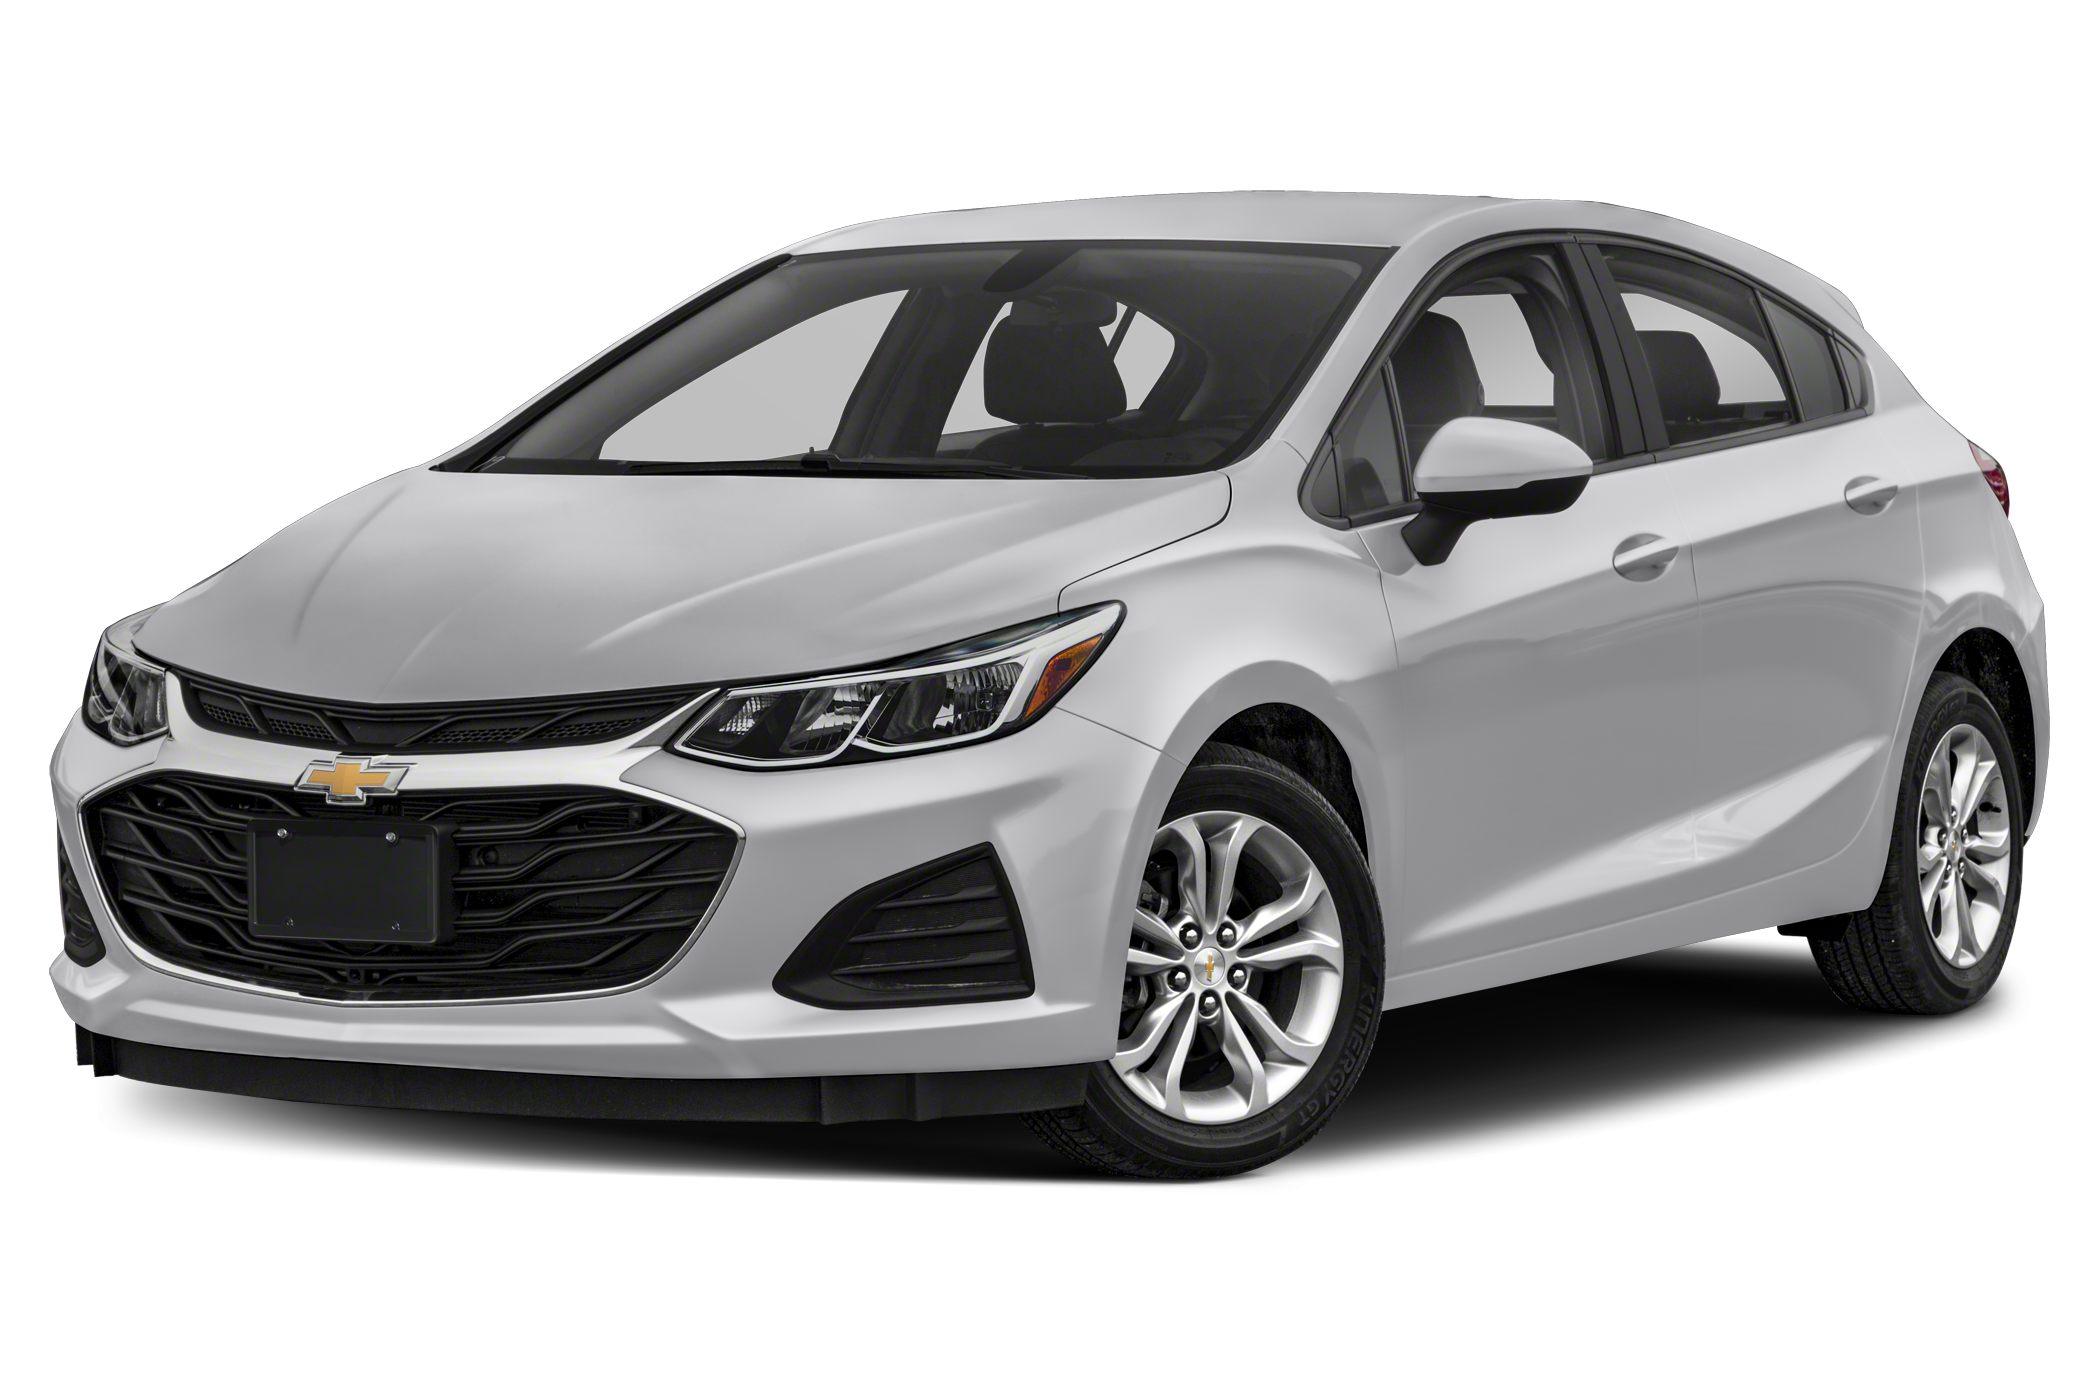 2019 Chevrolet Cruze Lt 4dr Hatchback Specs And Prices